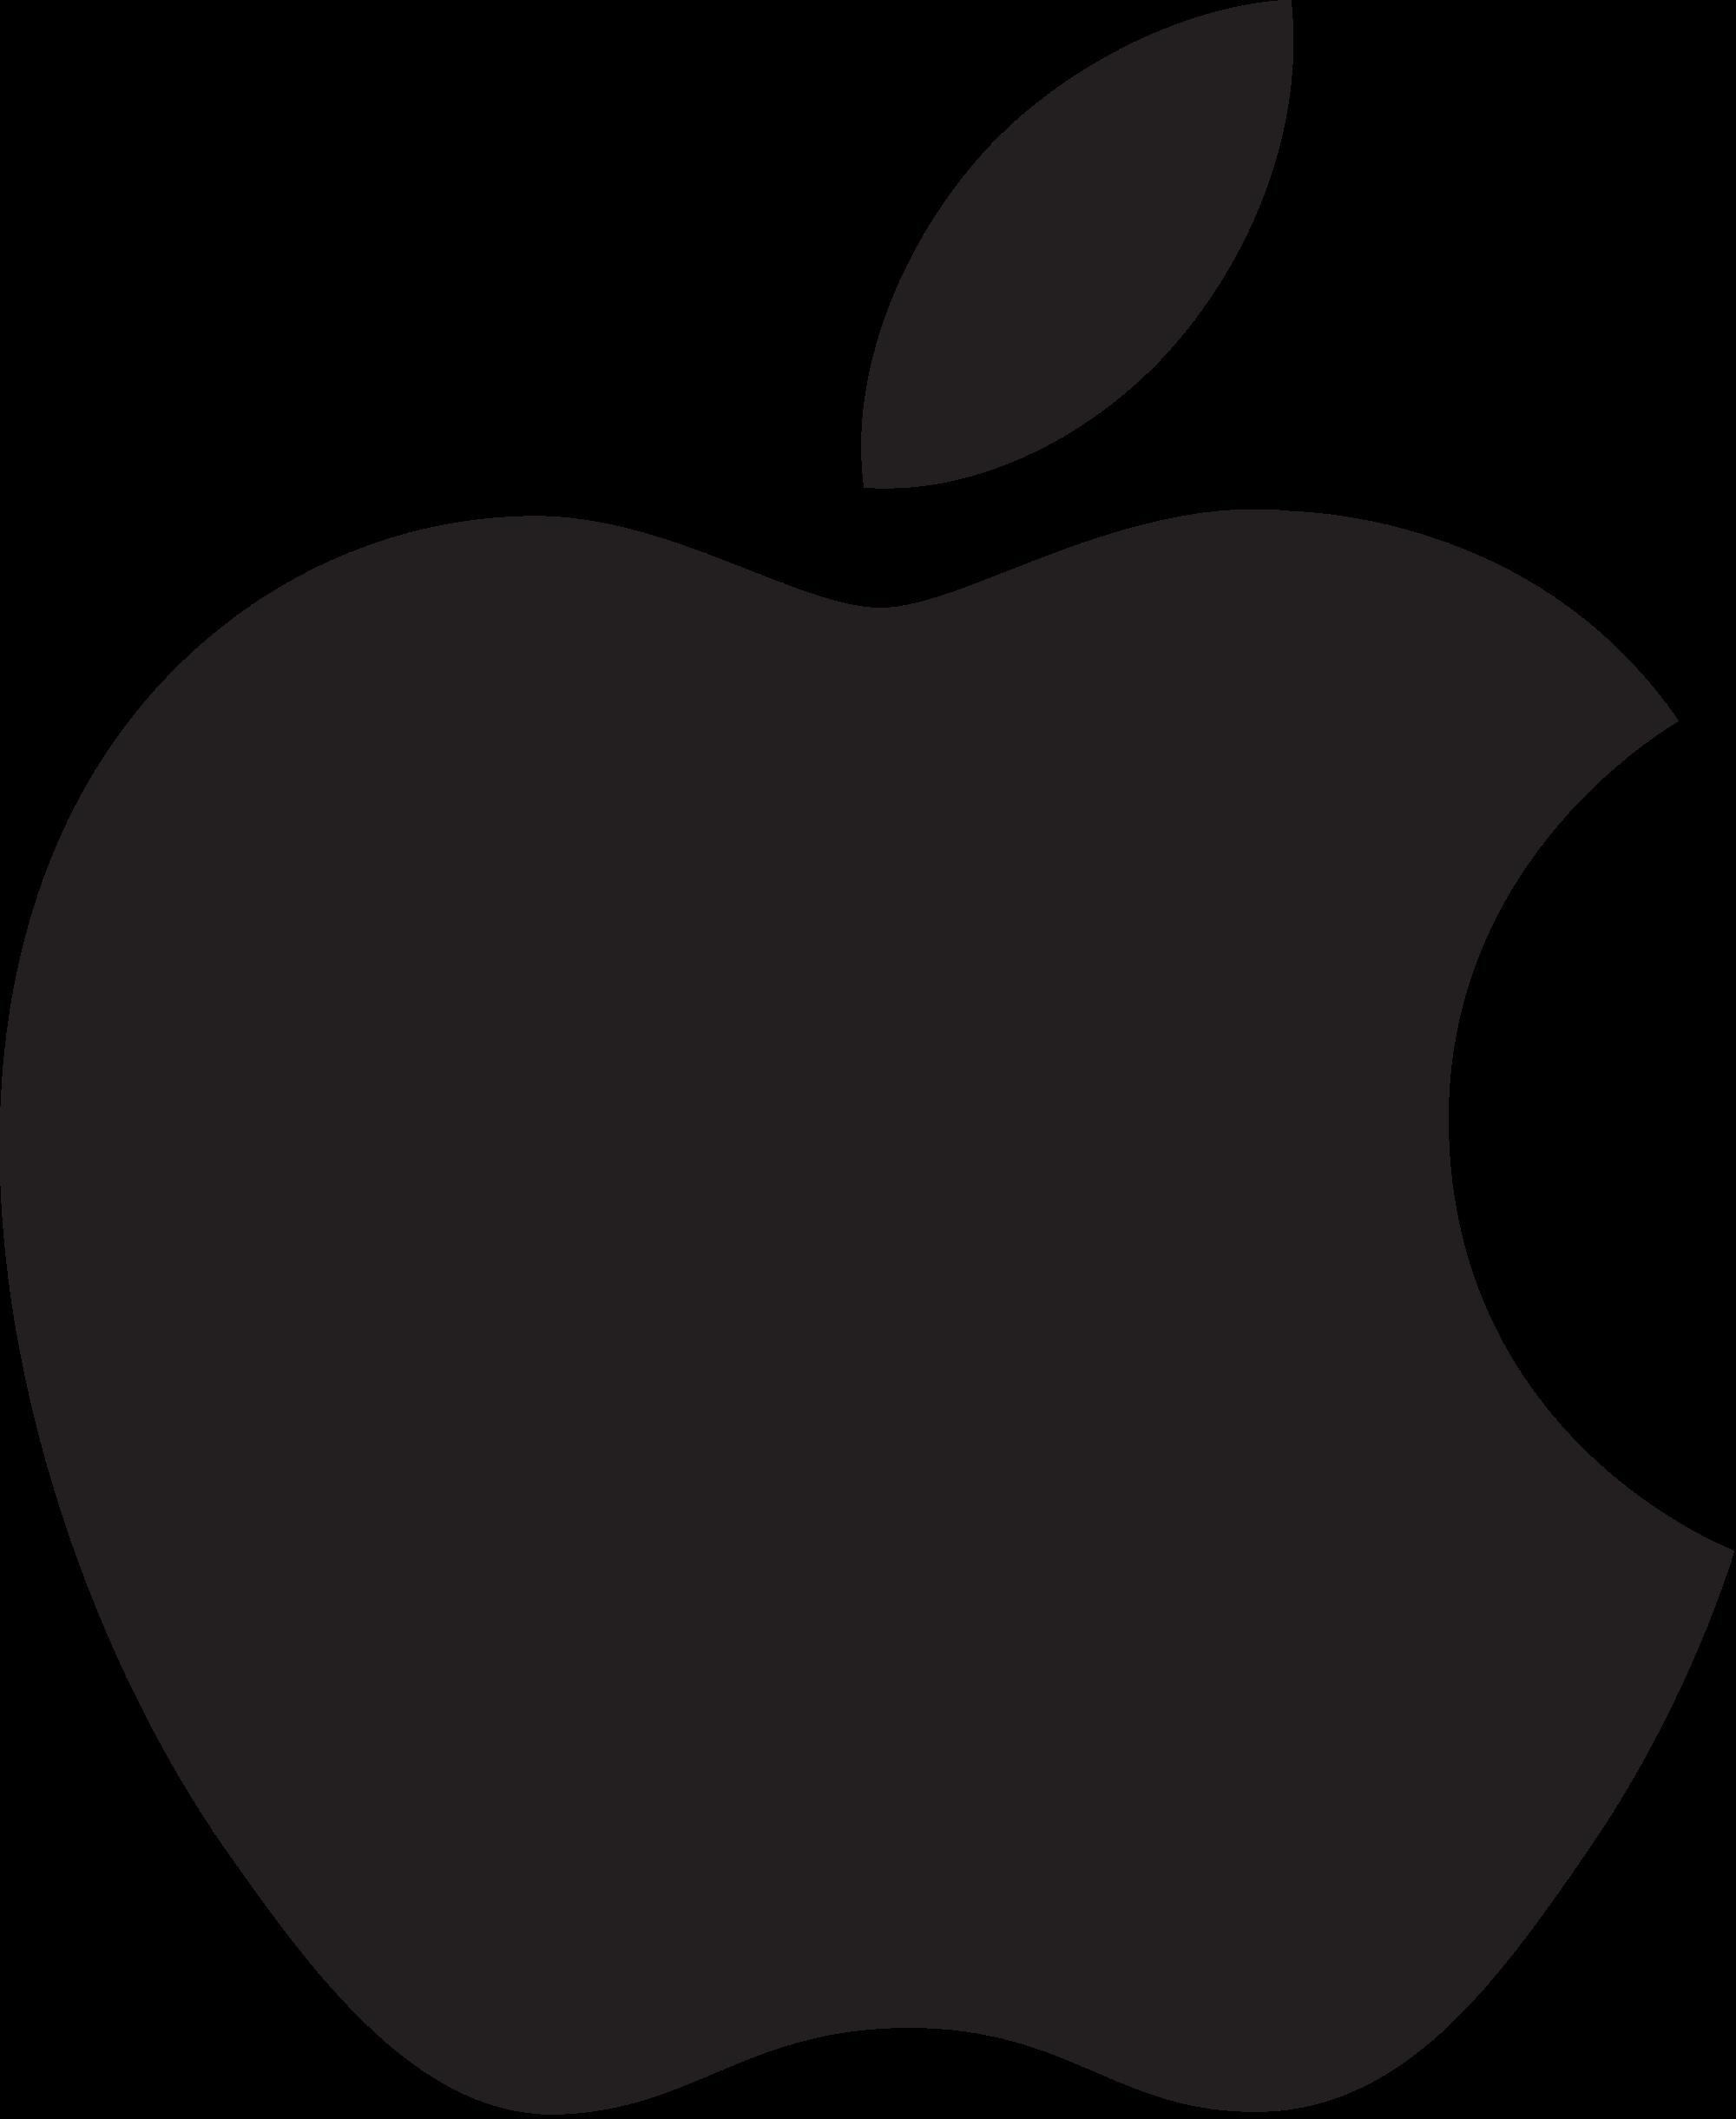 Apple_1998_Logo.png